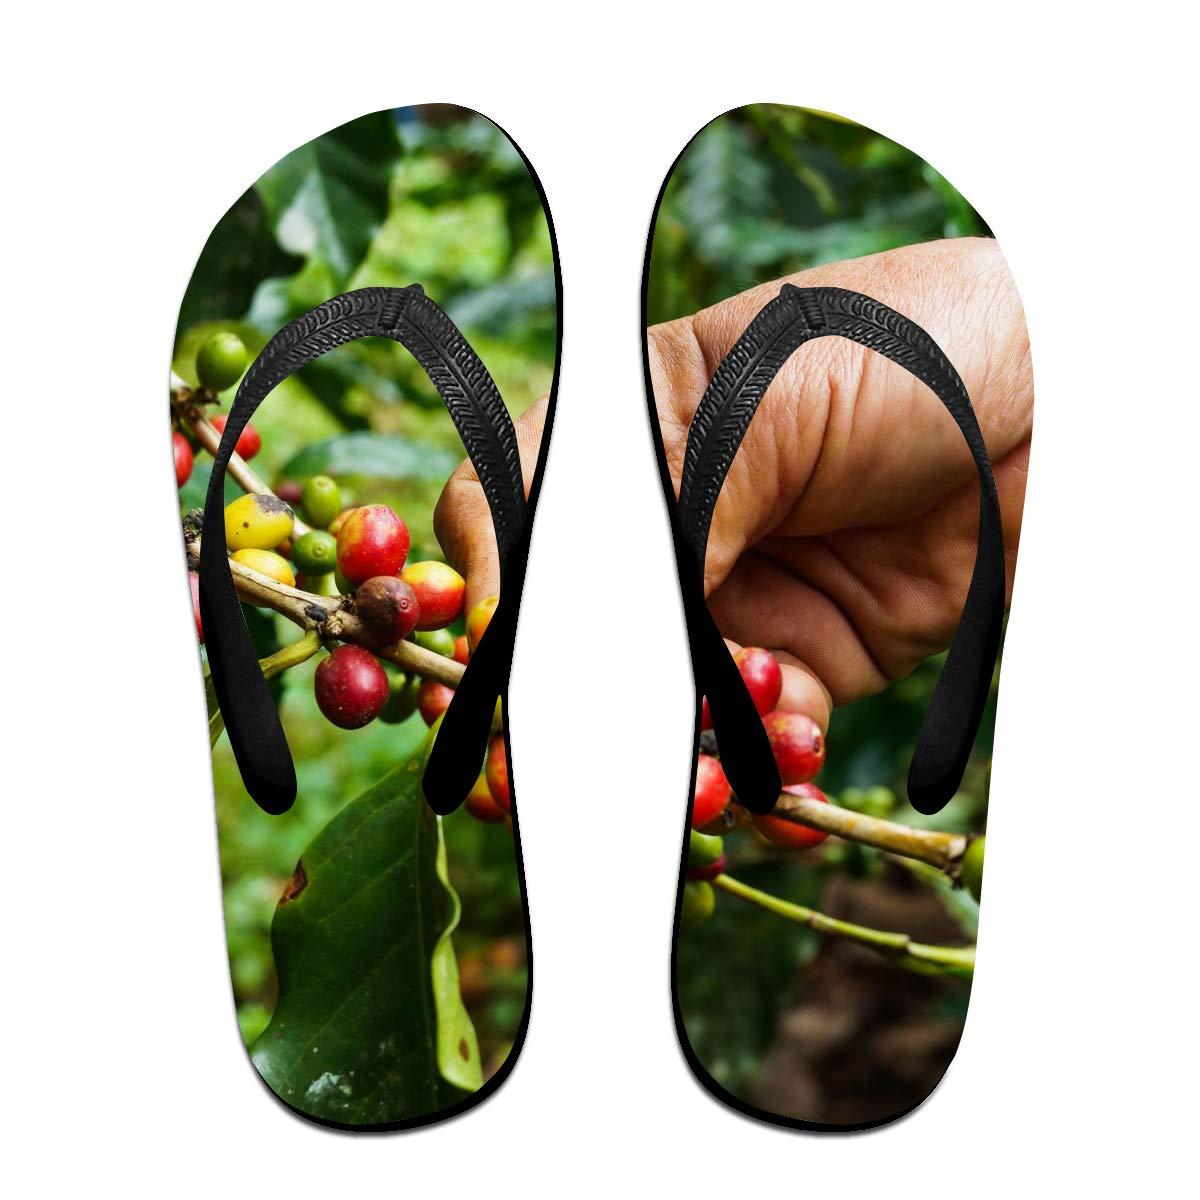 Lojaon Couple Slipper Gatherers Images Print Flip Flops Unisex Chic Sandals Rubber Non-Slip Spa Thong Slippers